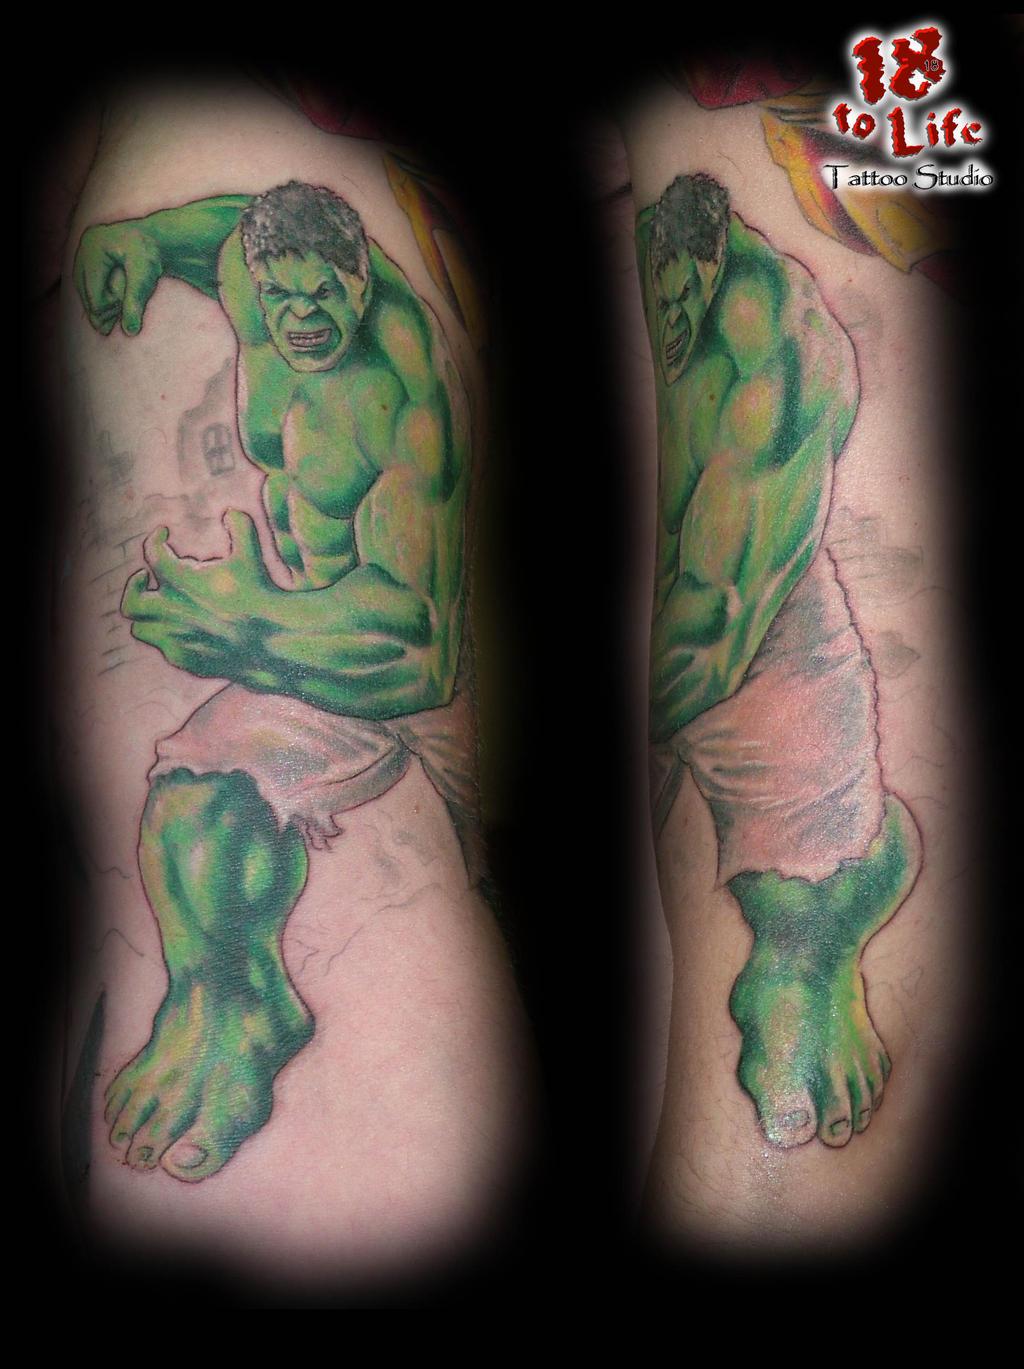 pin hulk arte tattoo fotos e ideias para tatuagens on pinterest. Black Bedroom Furniture Sets. Home Design Ideas